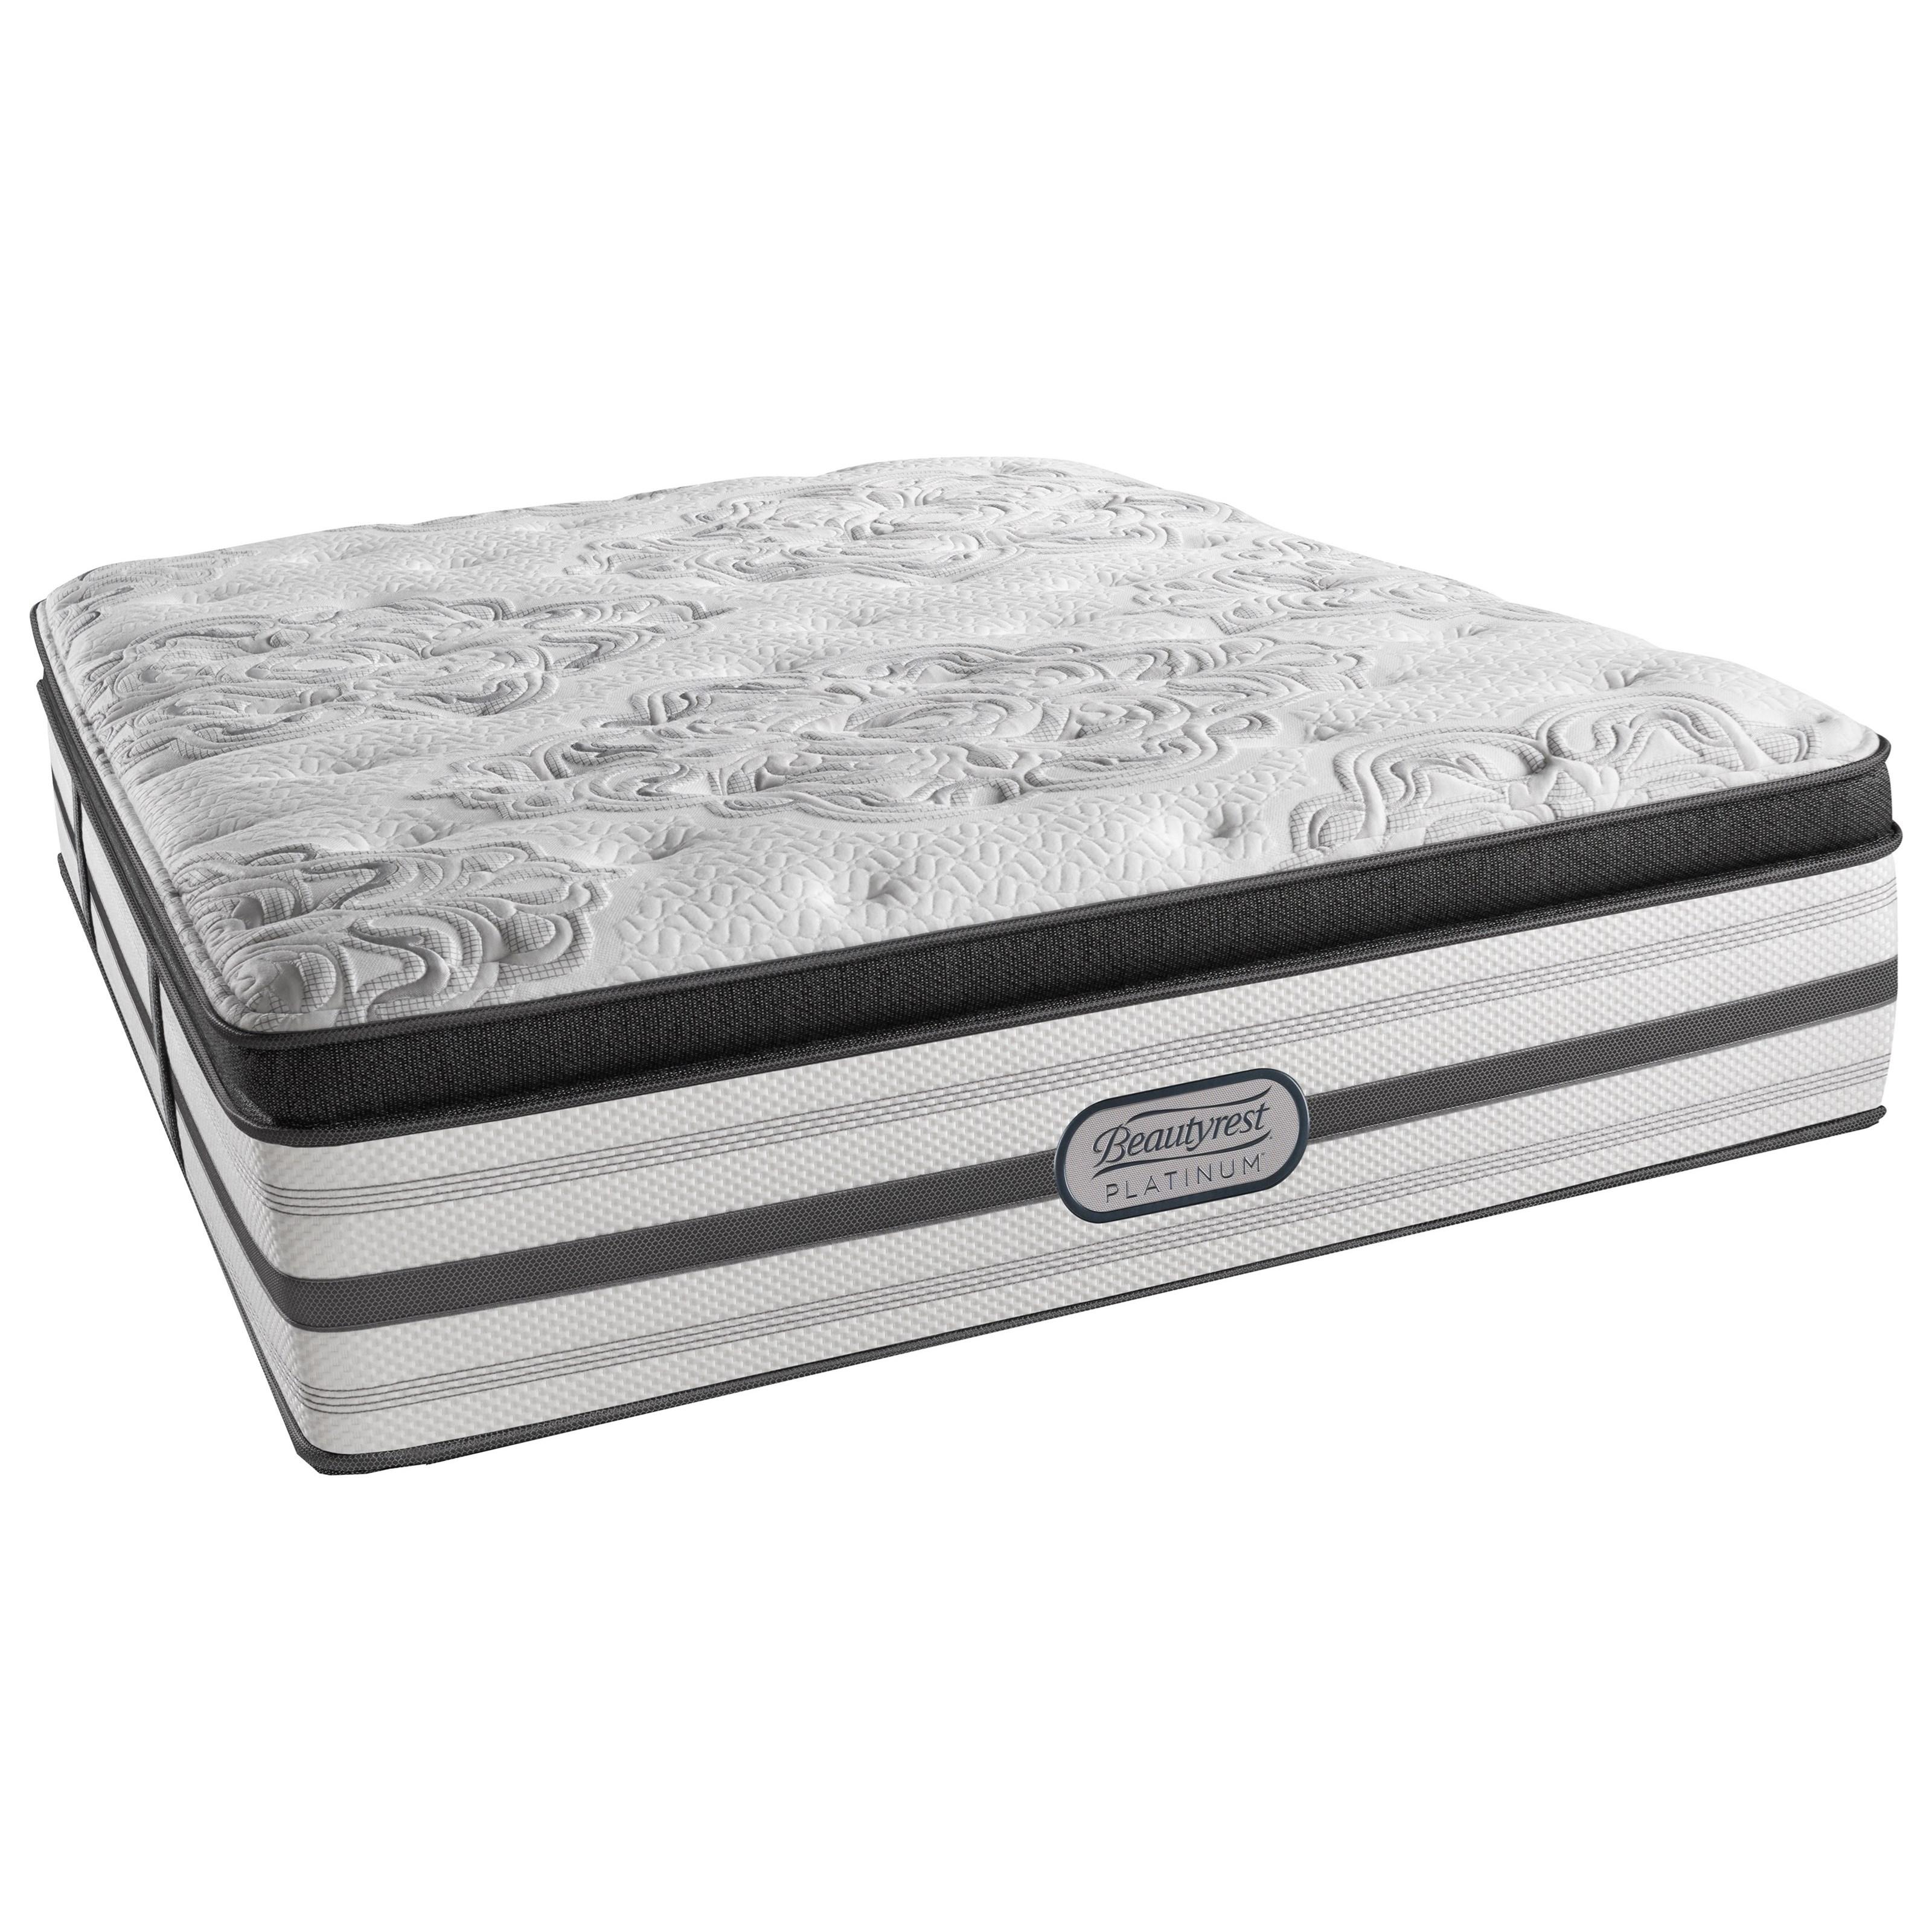 Beautyrest Platinum Katherine King Plush Box Top Adjustable Set - Item Number: LV4PLBT-K+2xSM1-TXLK